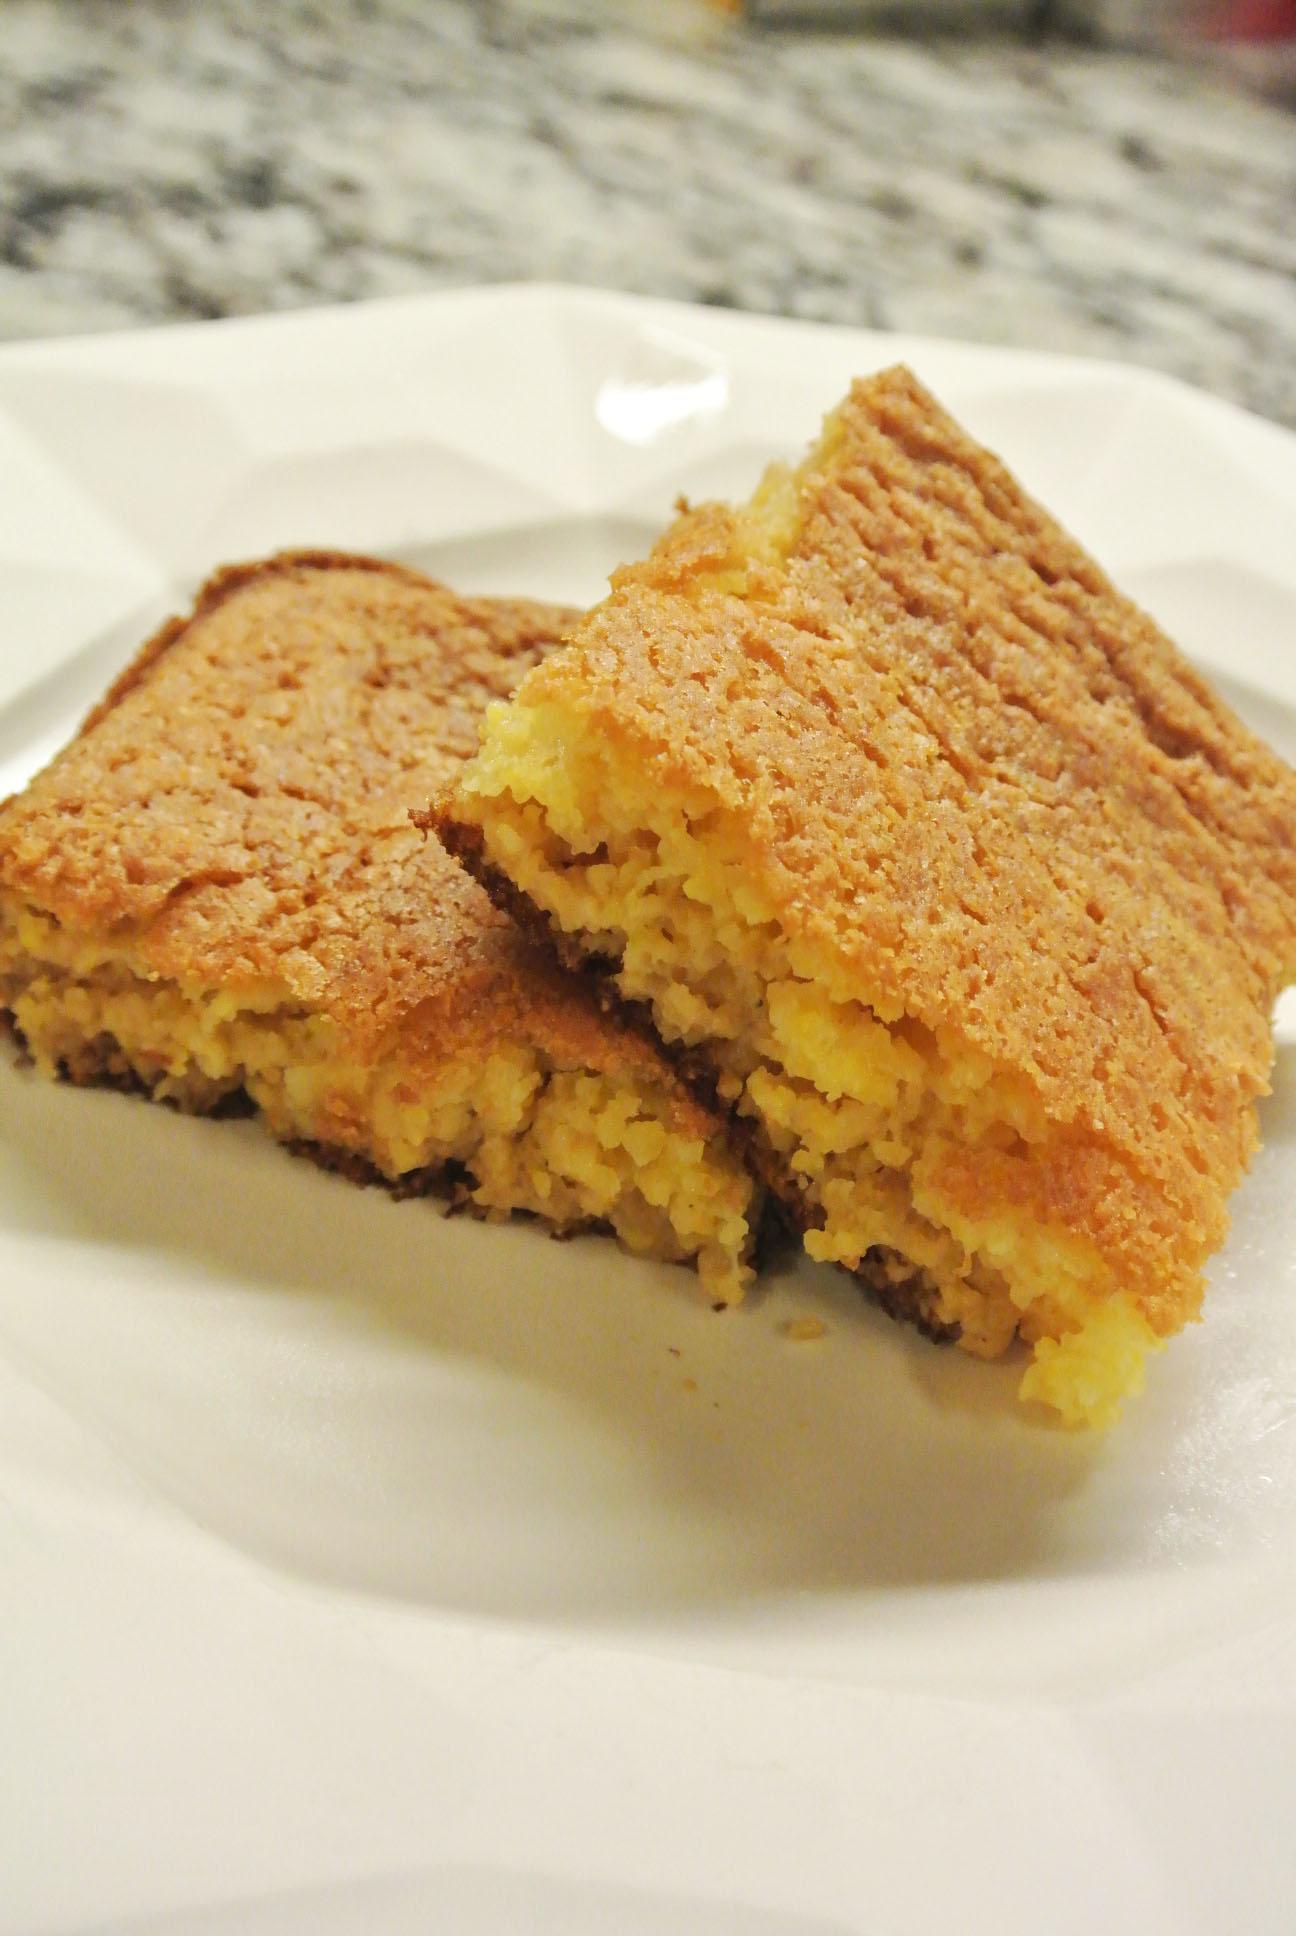 GF SF DF NF EF Corn Bread (9)